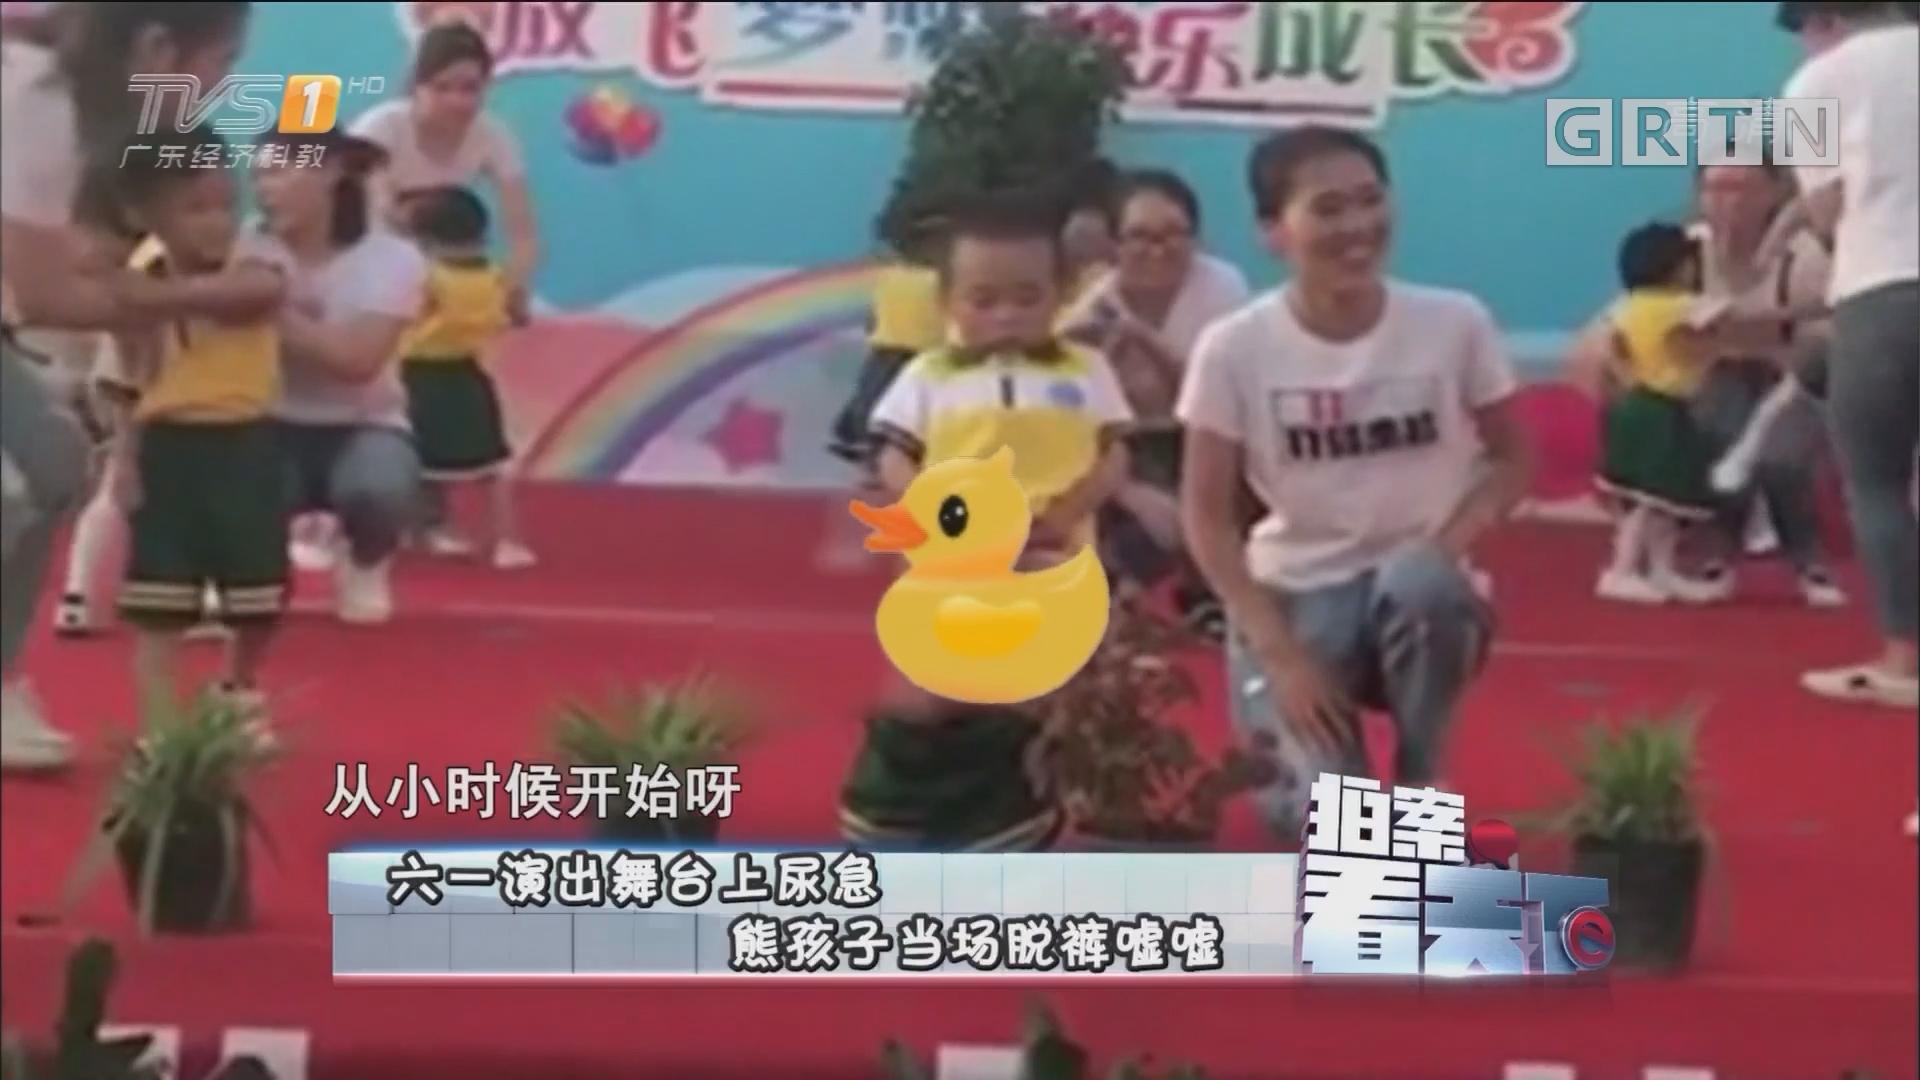 [HD][2017-06-01]拍案看天下:六一演出舞台上尿急 熊孩子当场脱裤嘘嘘